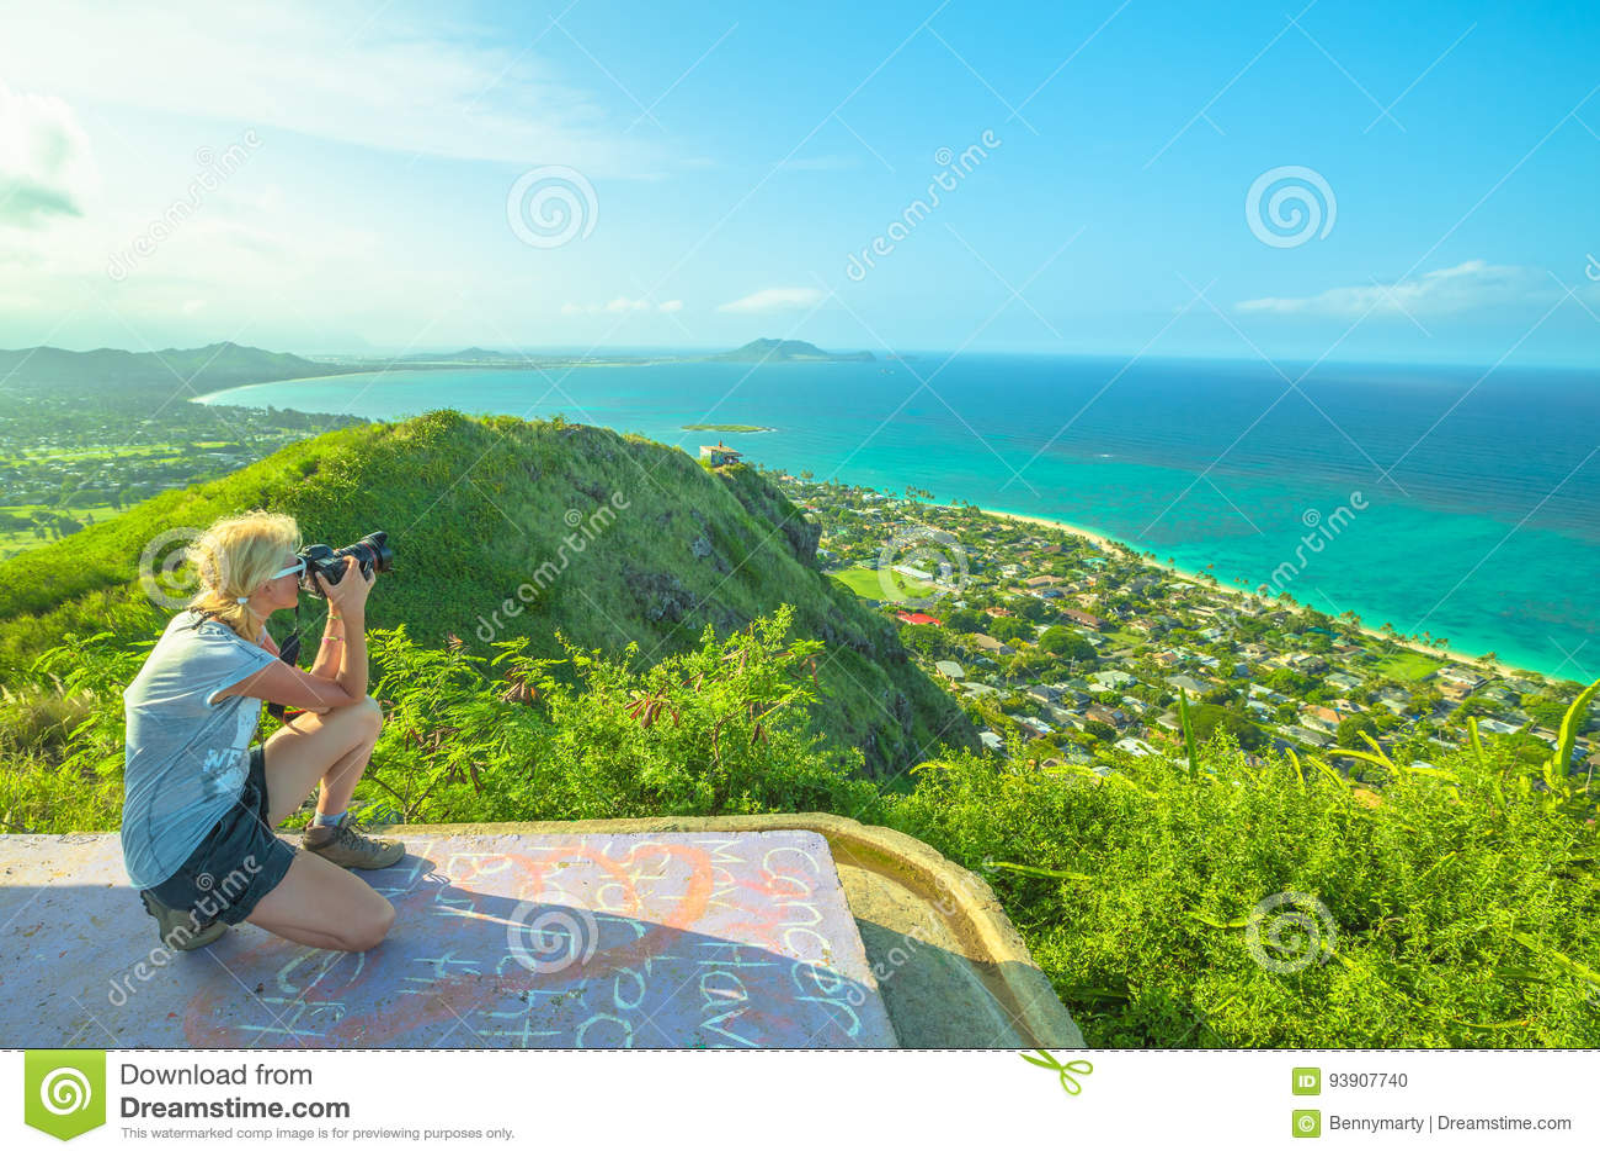 Travel photographer in Hawaii